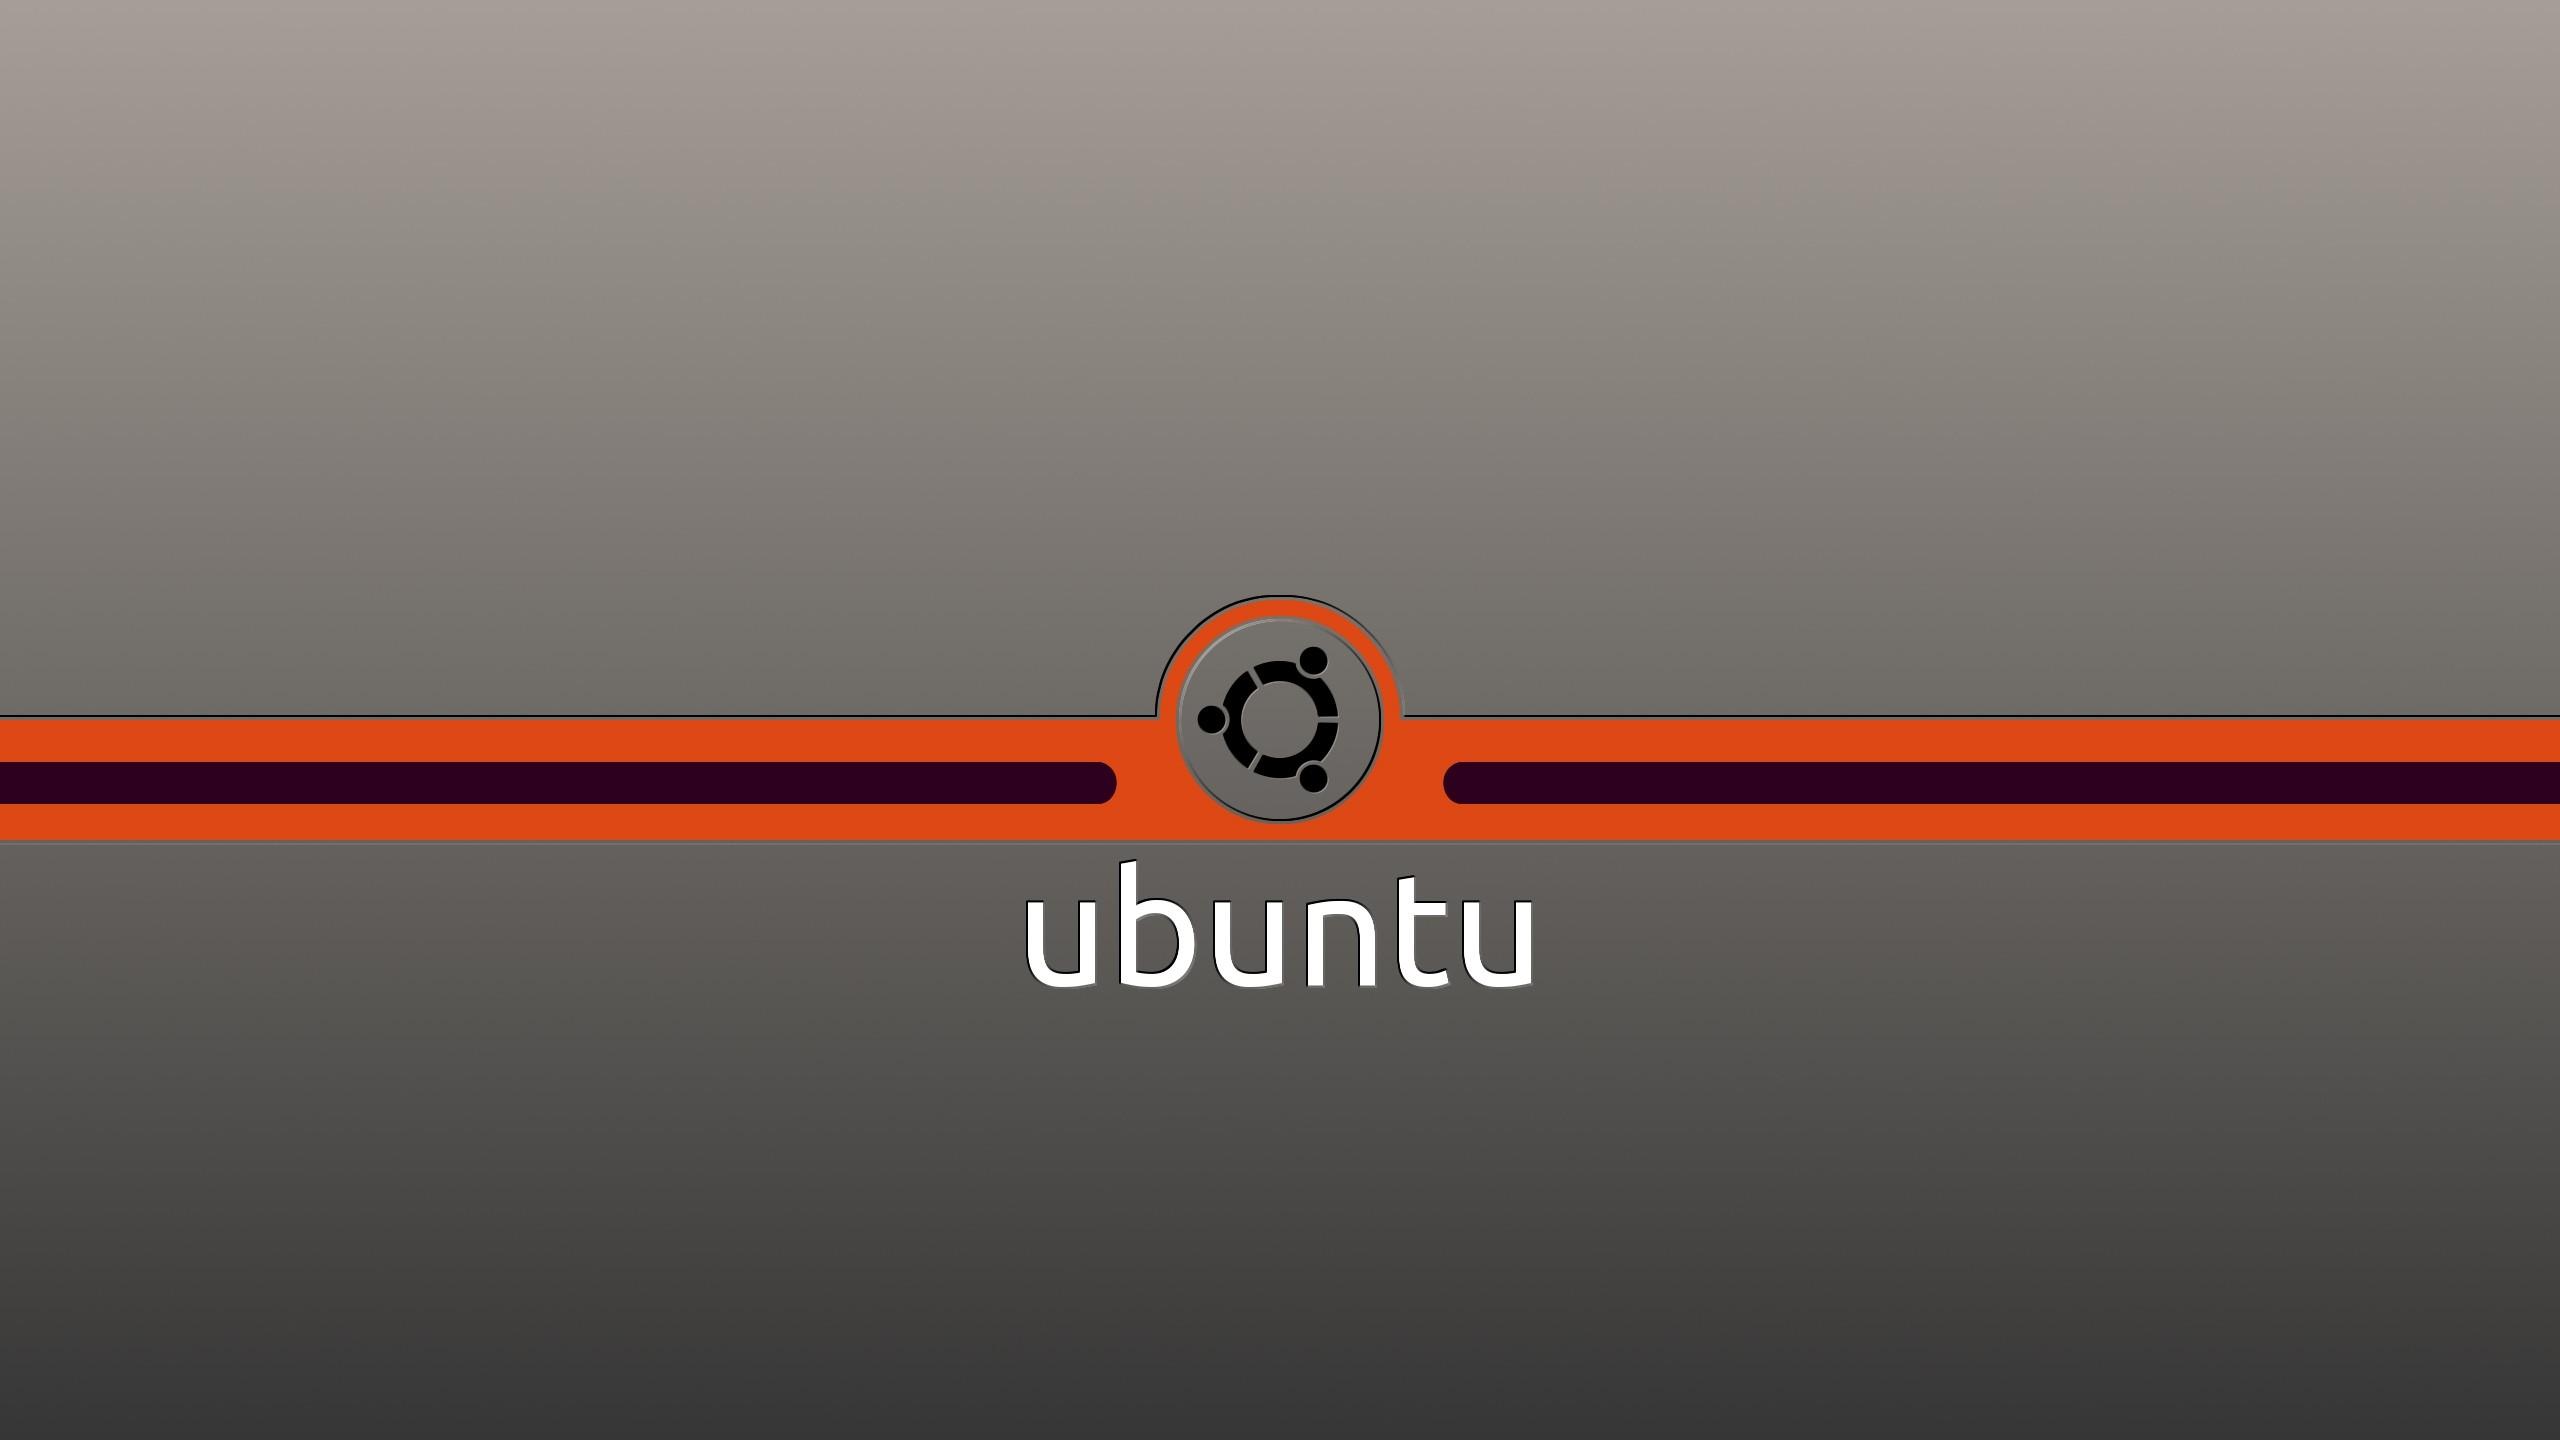 Download Linux Ubuntu Wallpaper 2560x1440 Wallpoper 407364 2560x1440